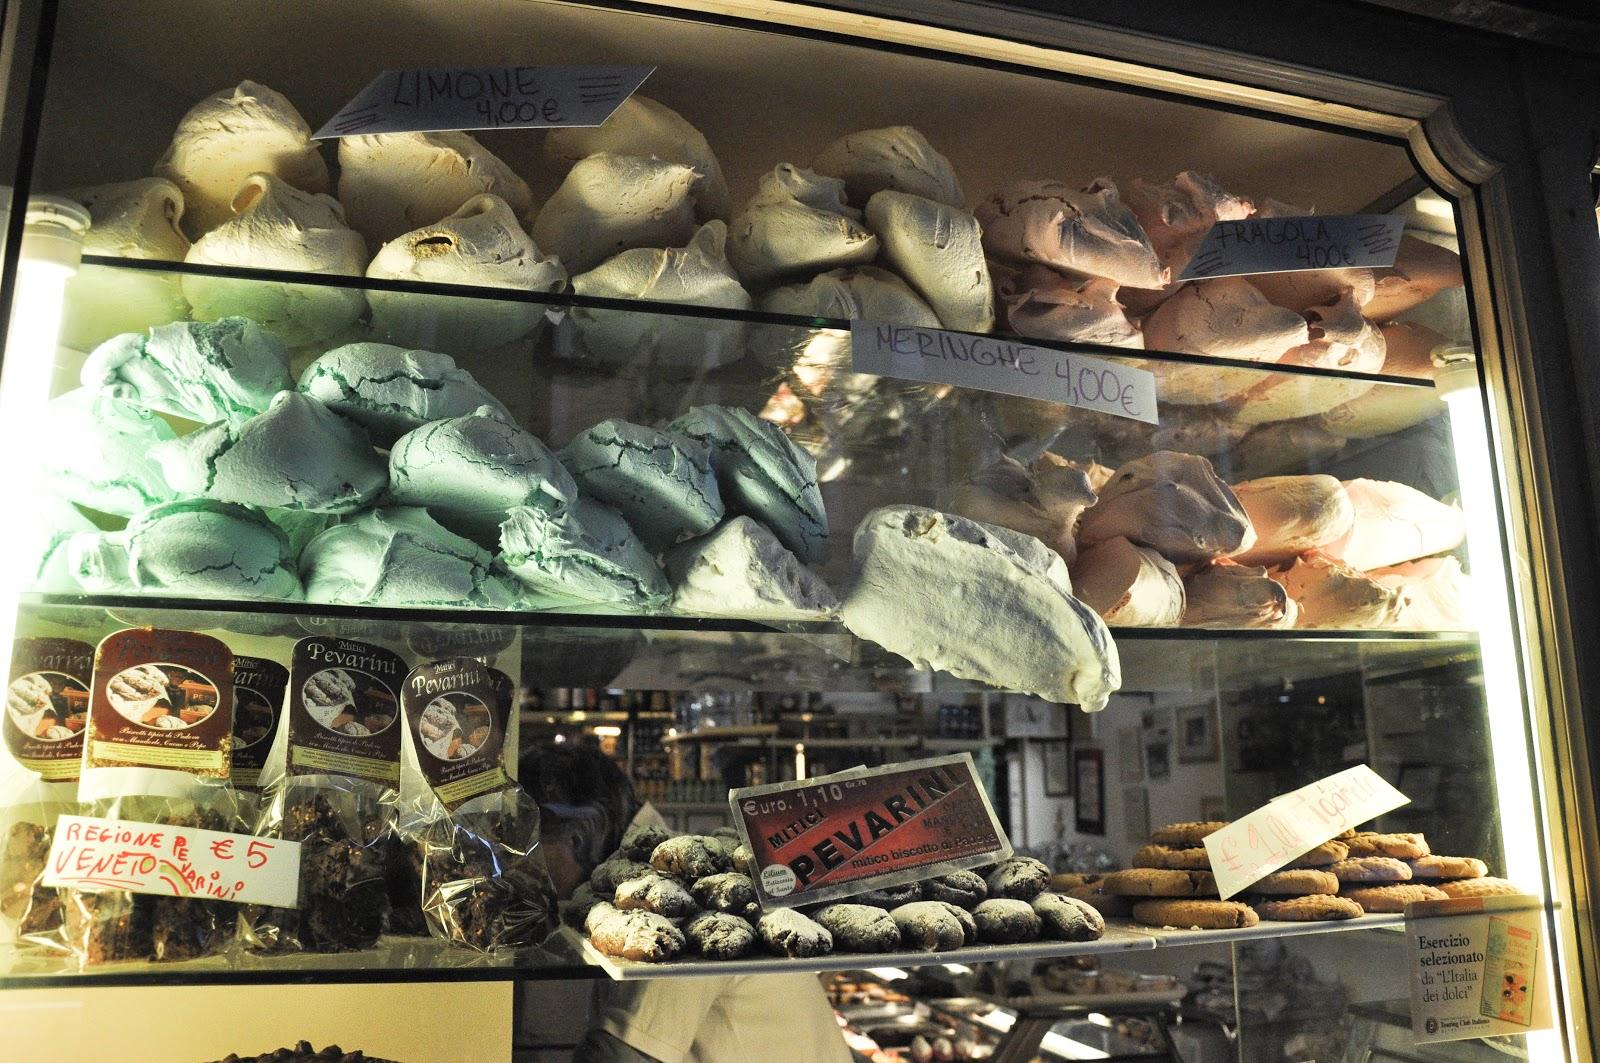 Giant meringues in the window display of a patisserie in Padua, Italy